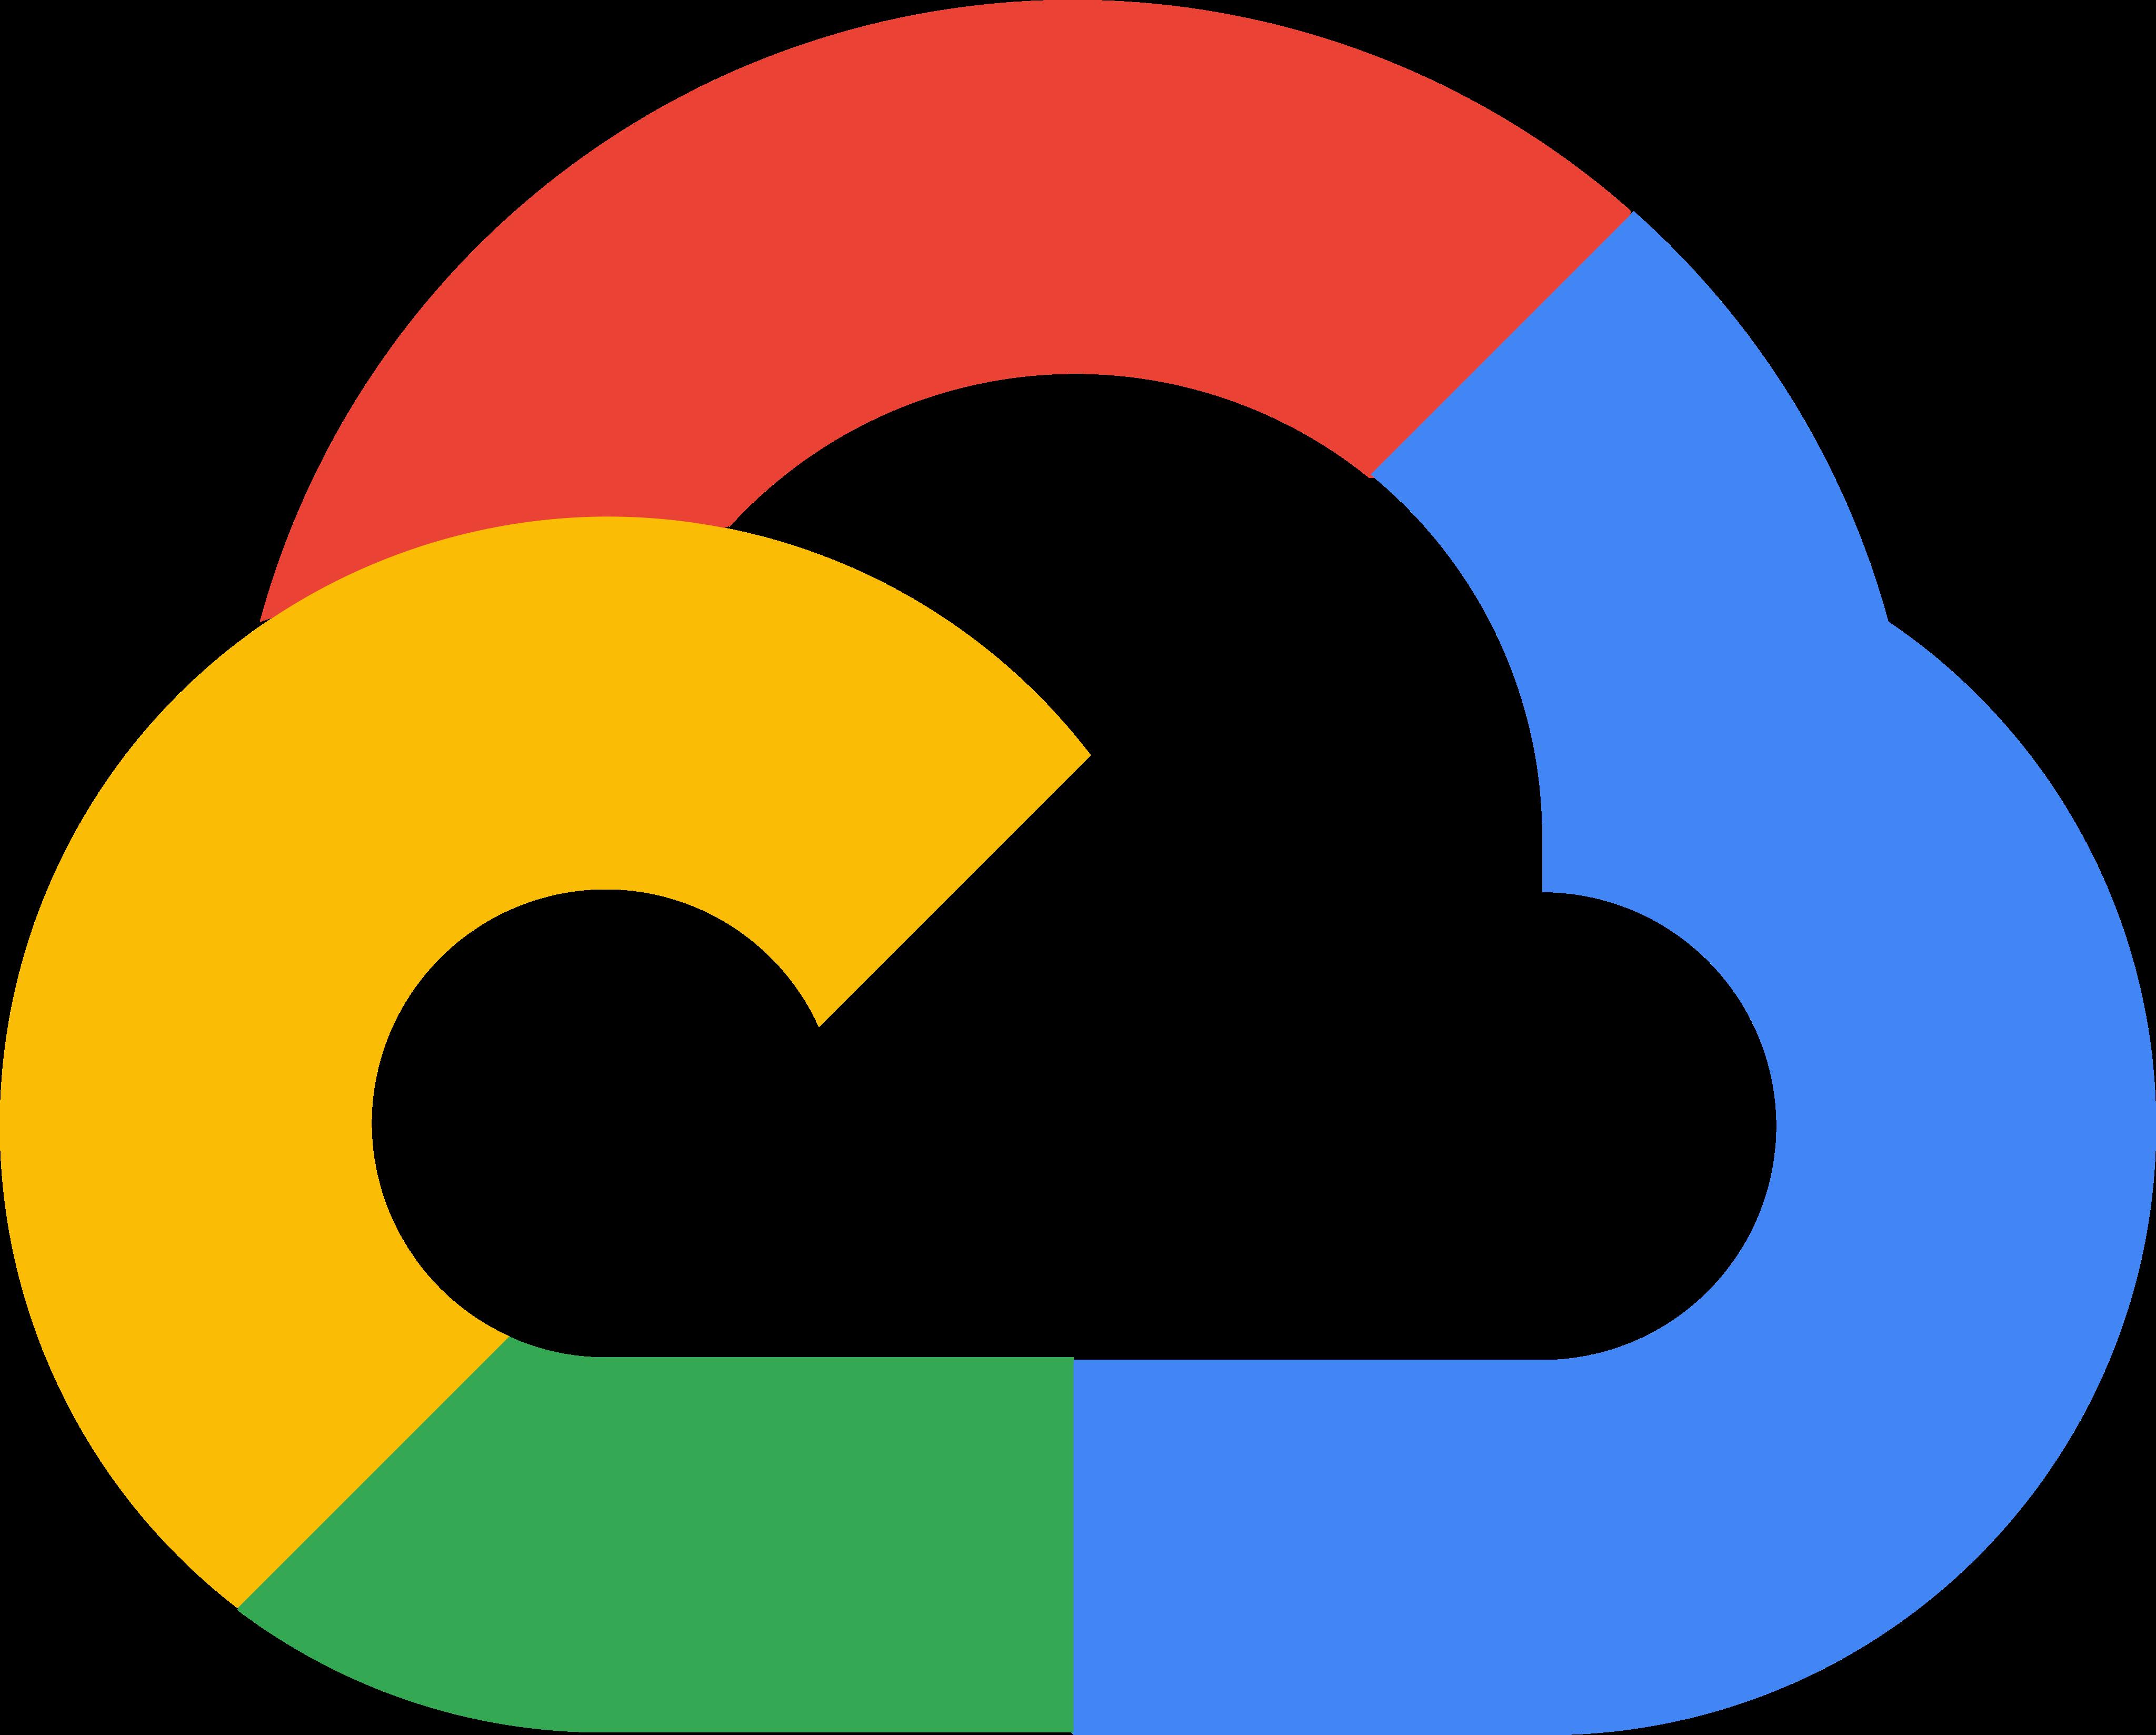 google cloud logo 5 - Google Cloud Logo